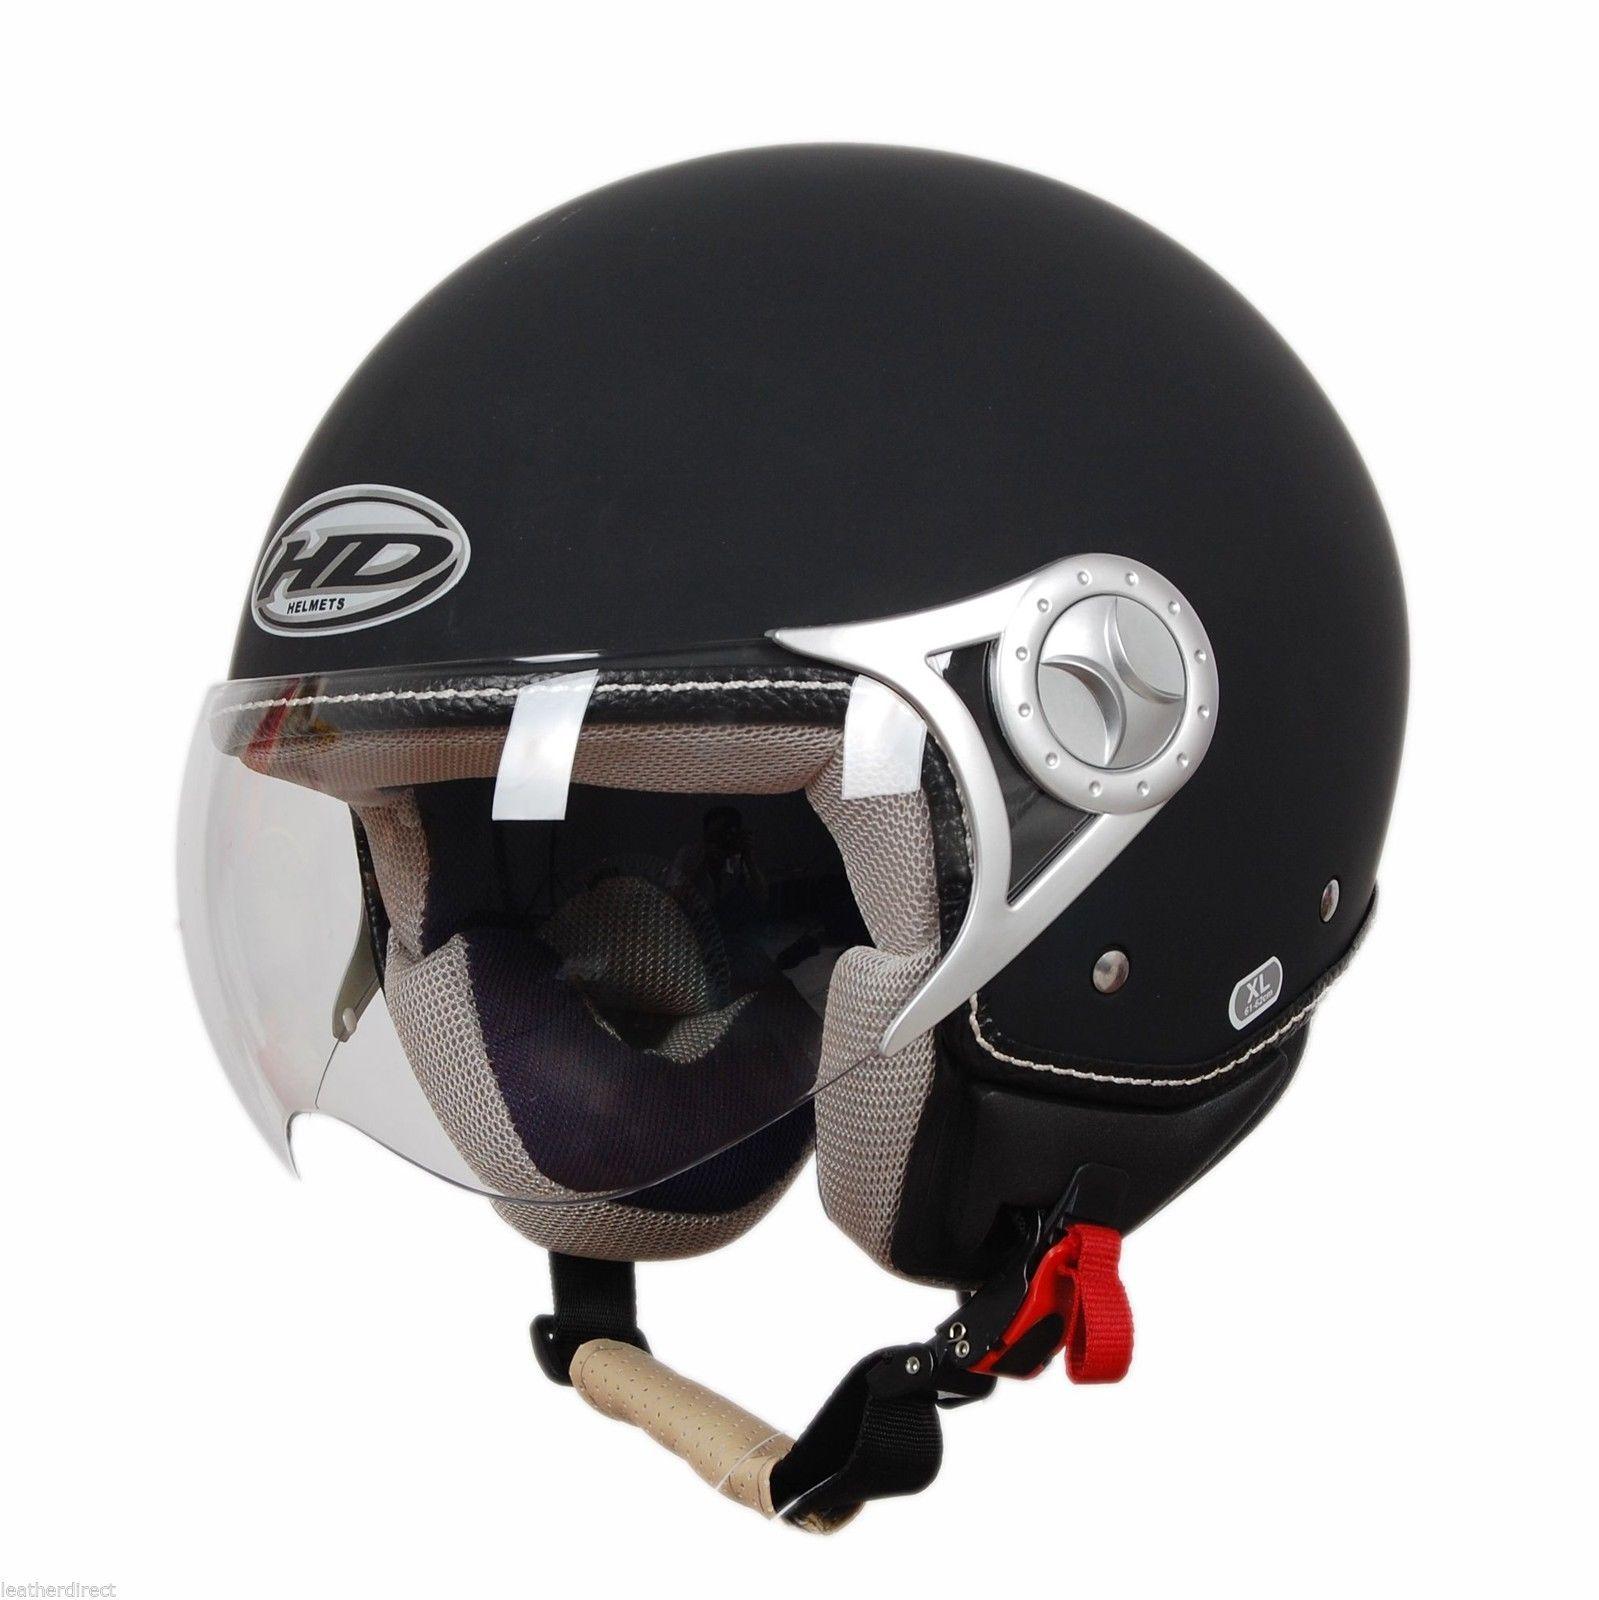 NEW OPEN FACE BLACK SCOOTER MOTORBIKE MOTORCYCLE HELMET